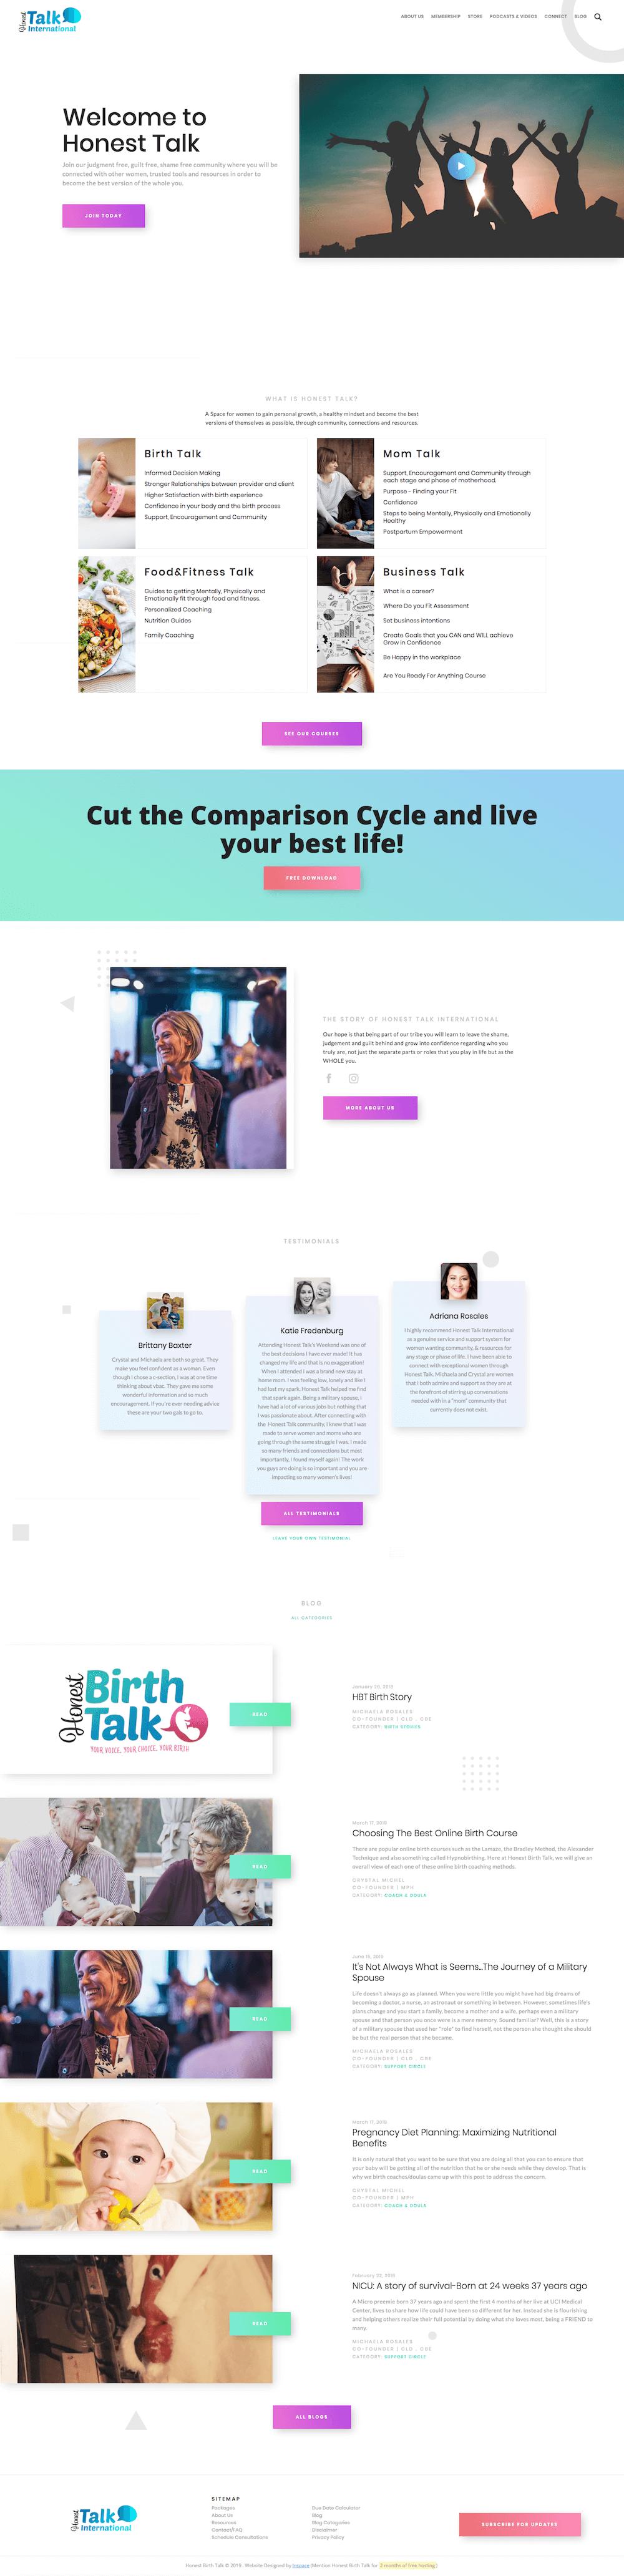 Honest Talk's Website Preview